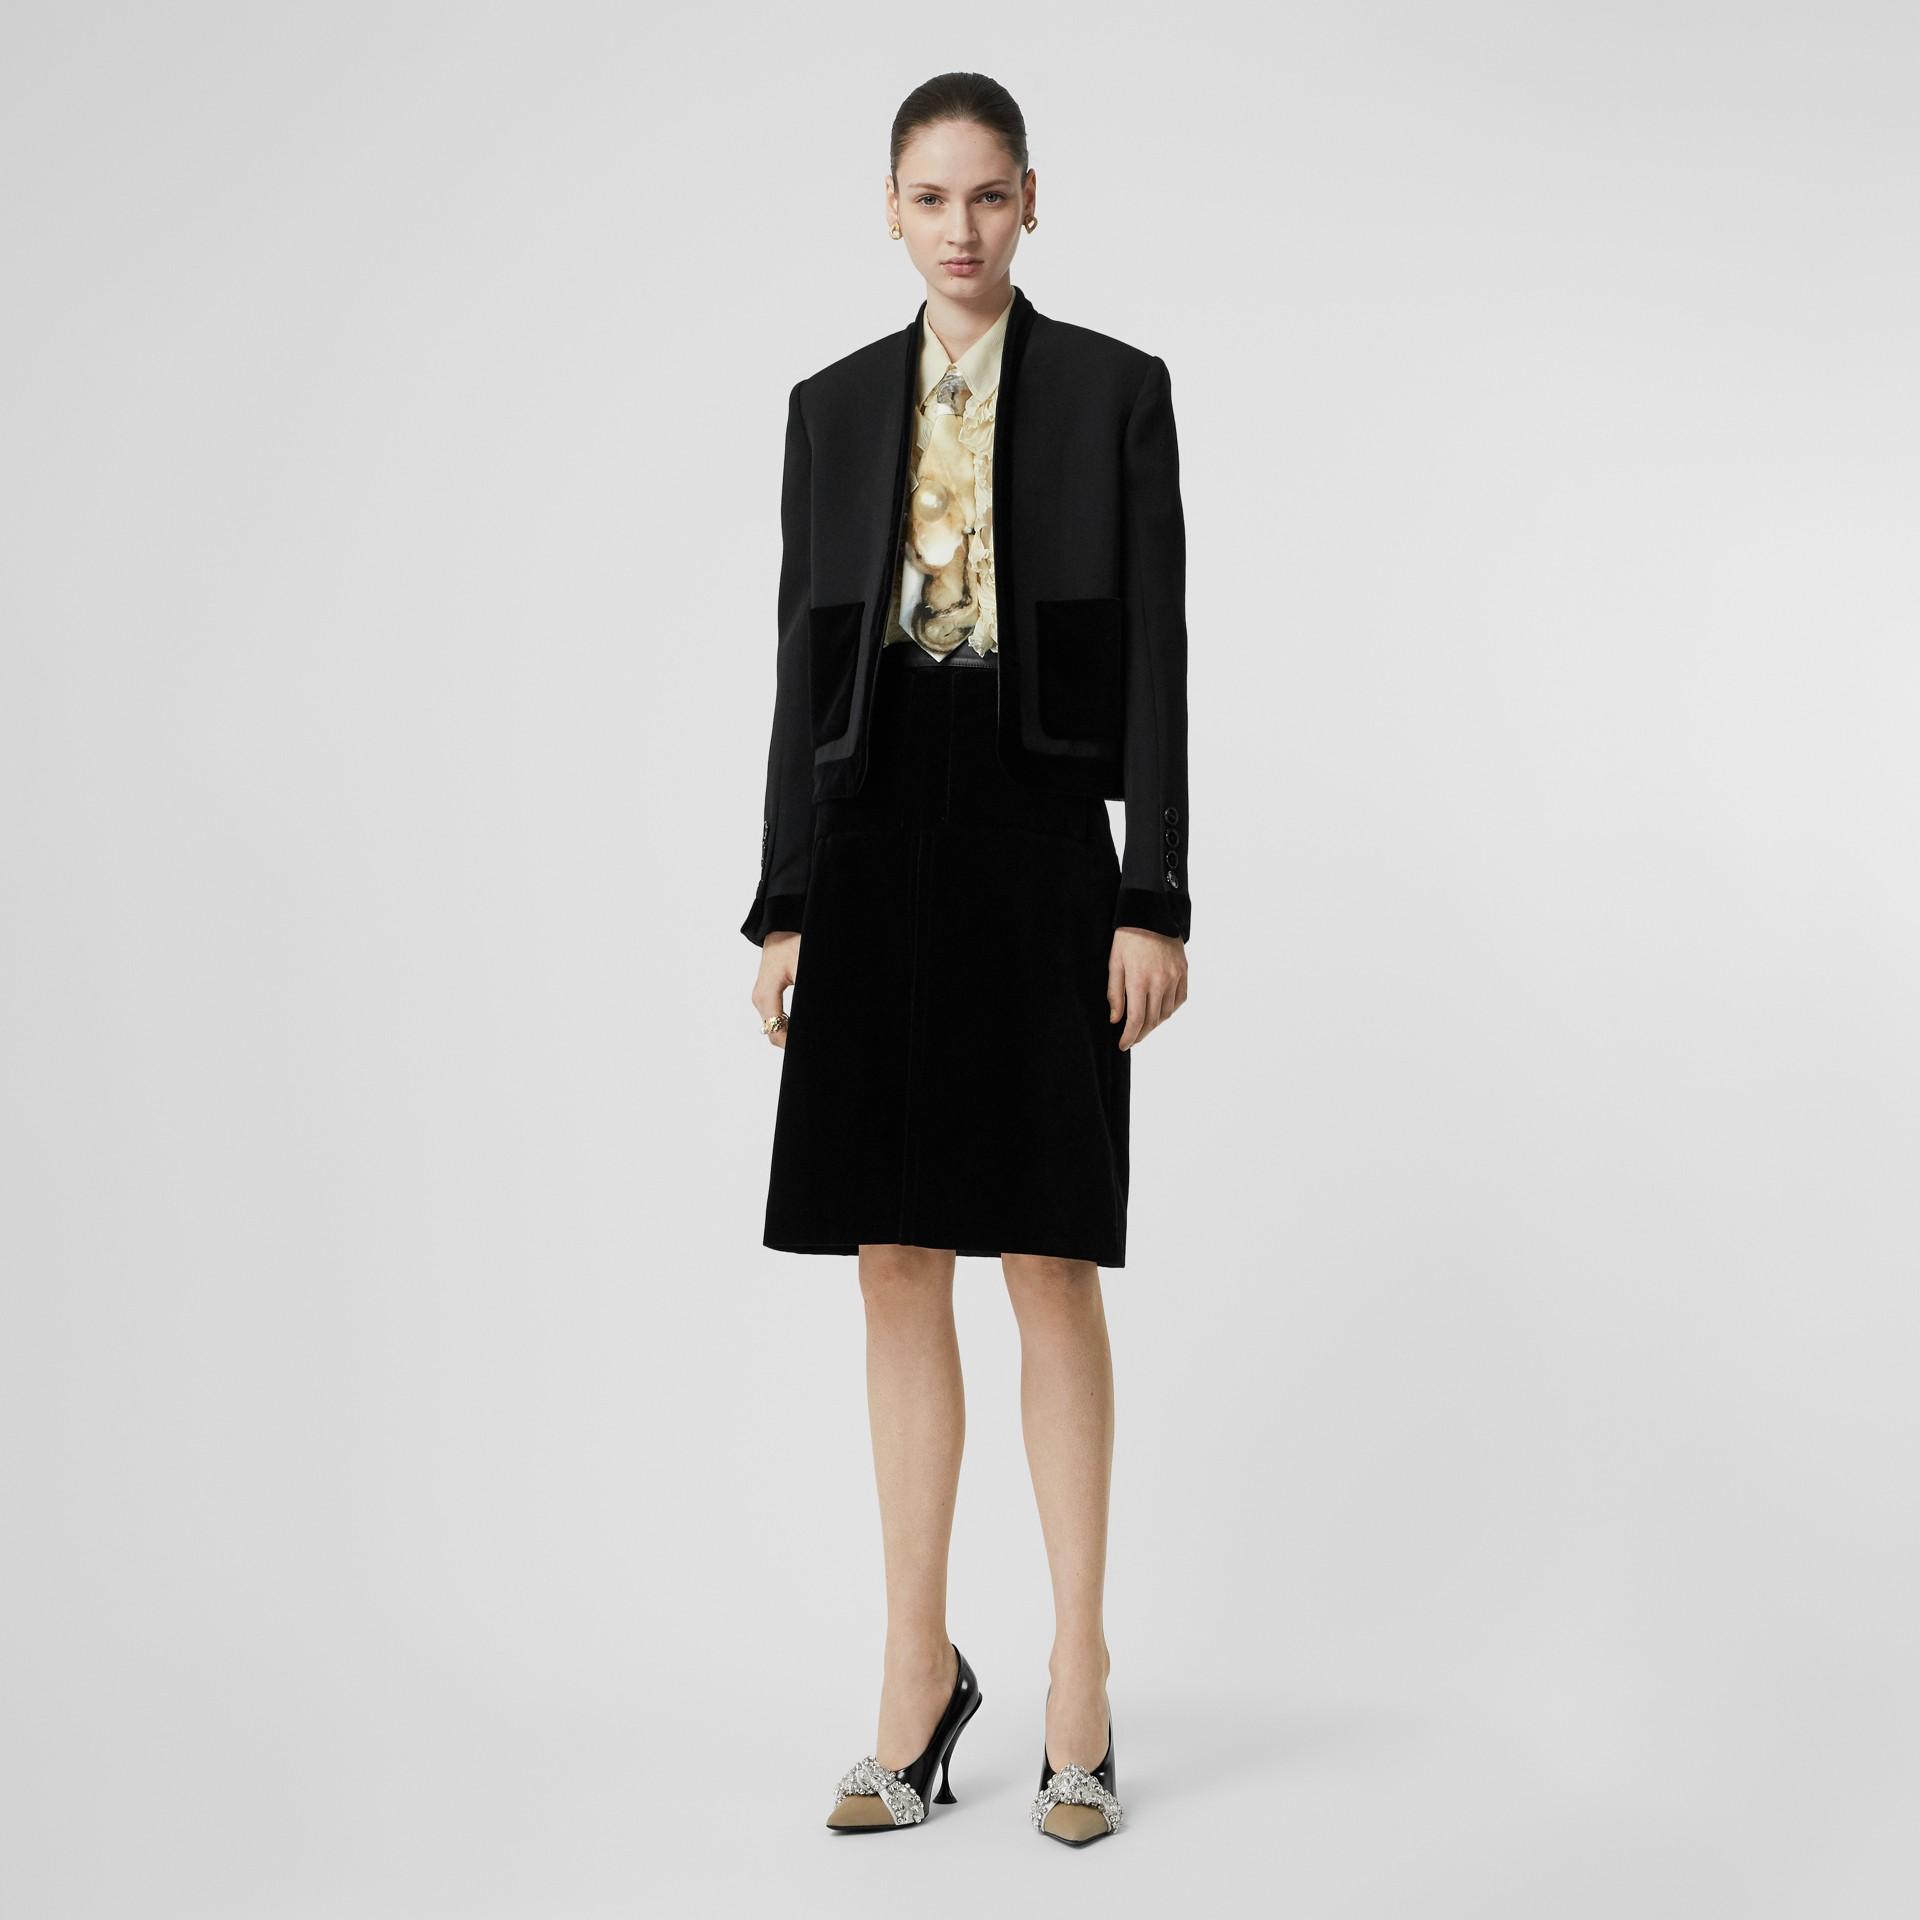 Lambskin Trim Box Pleat Detail Velvet and Wool Skirt in Black - Women | Burberry - gallery image 0